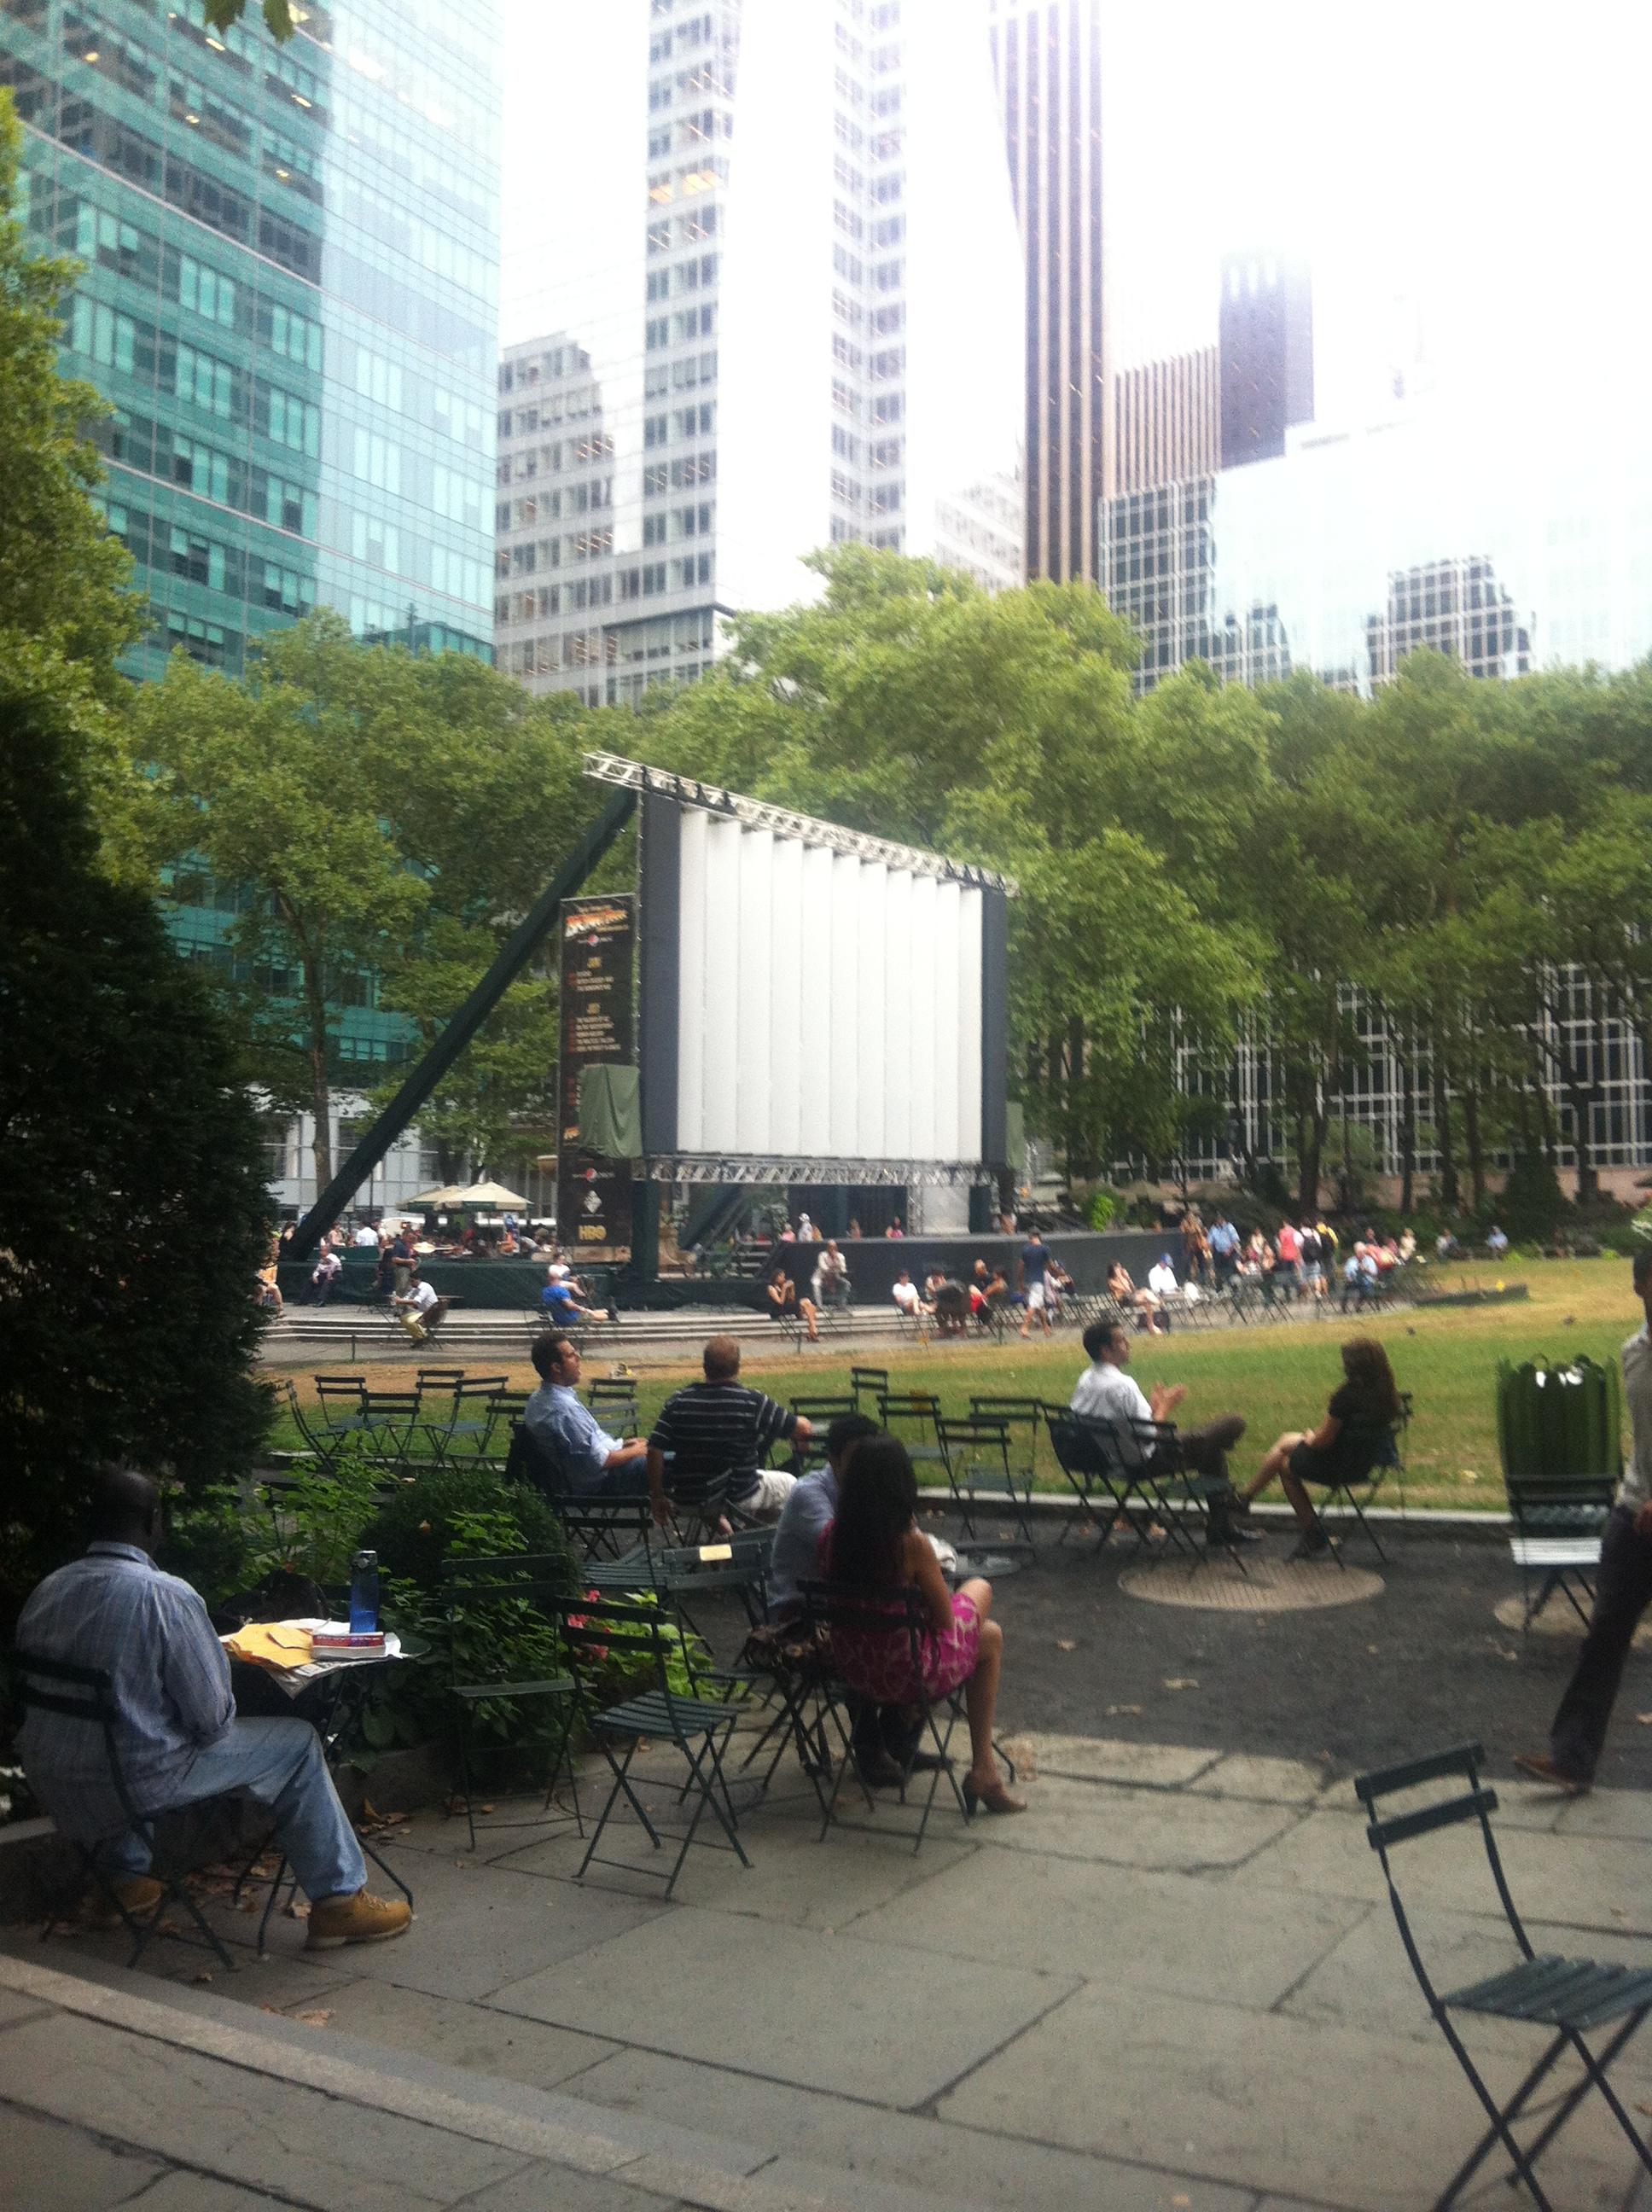 纽约一景——bryant park_图1-5